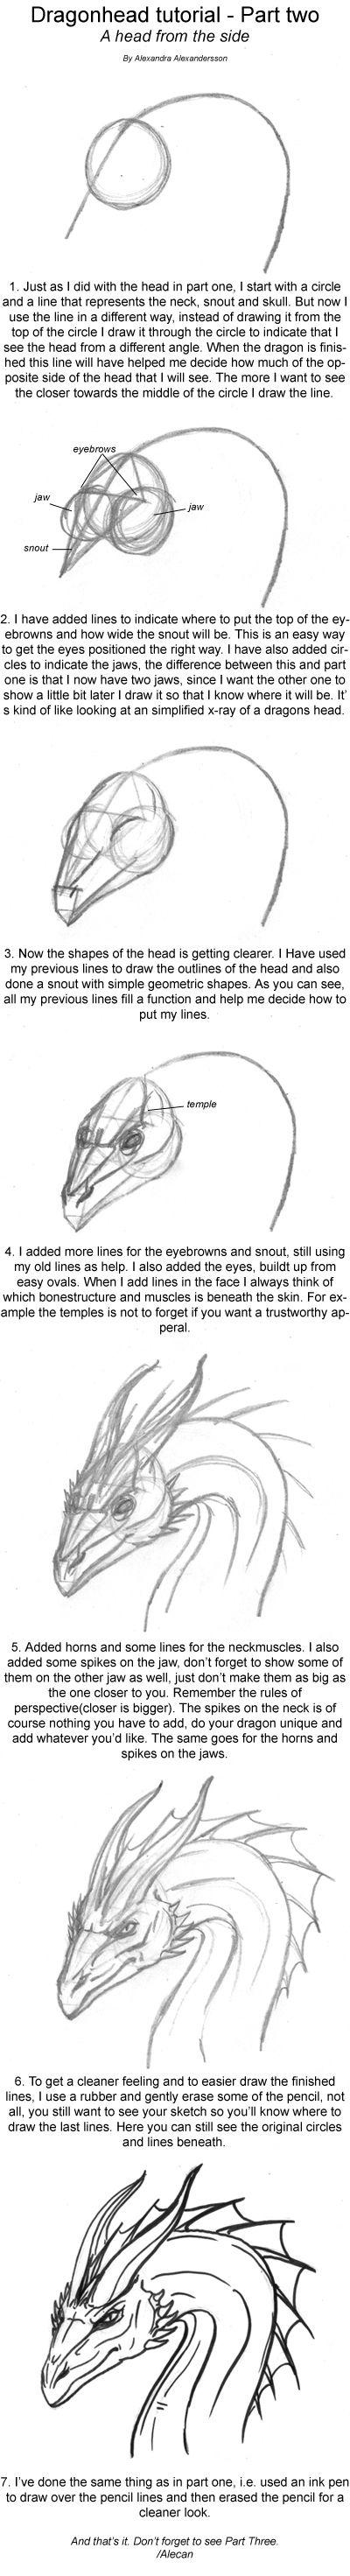 Dragonhead_Tutorial_part_two_by_alecan.jpg (400×2943)